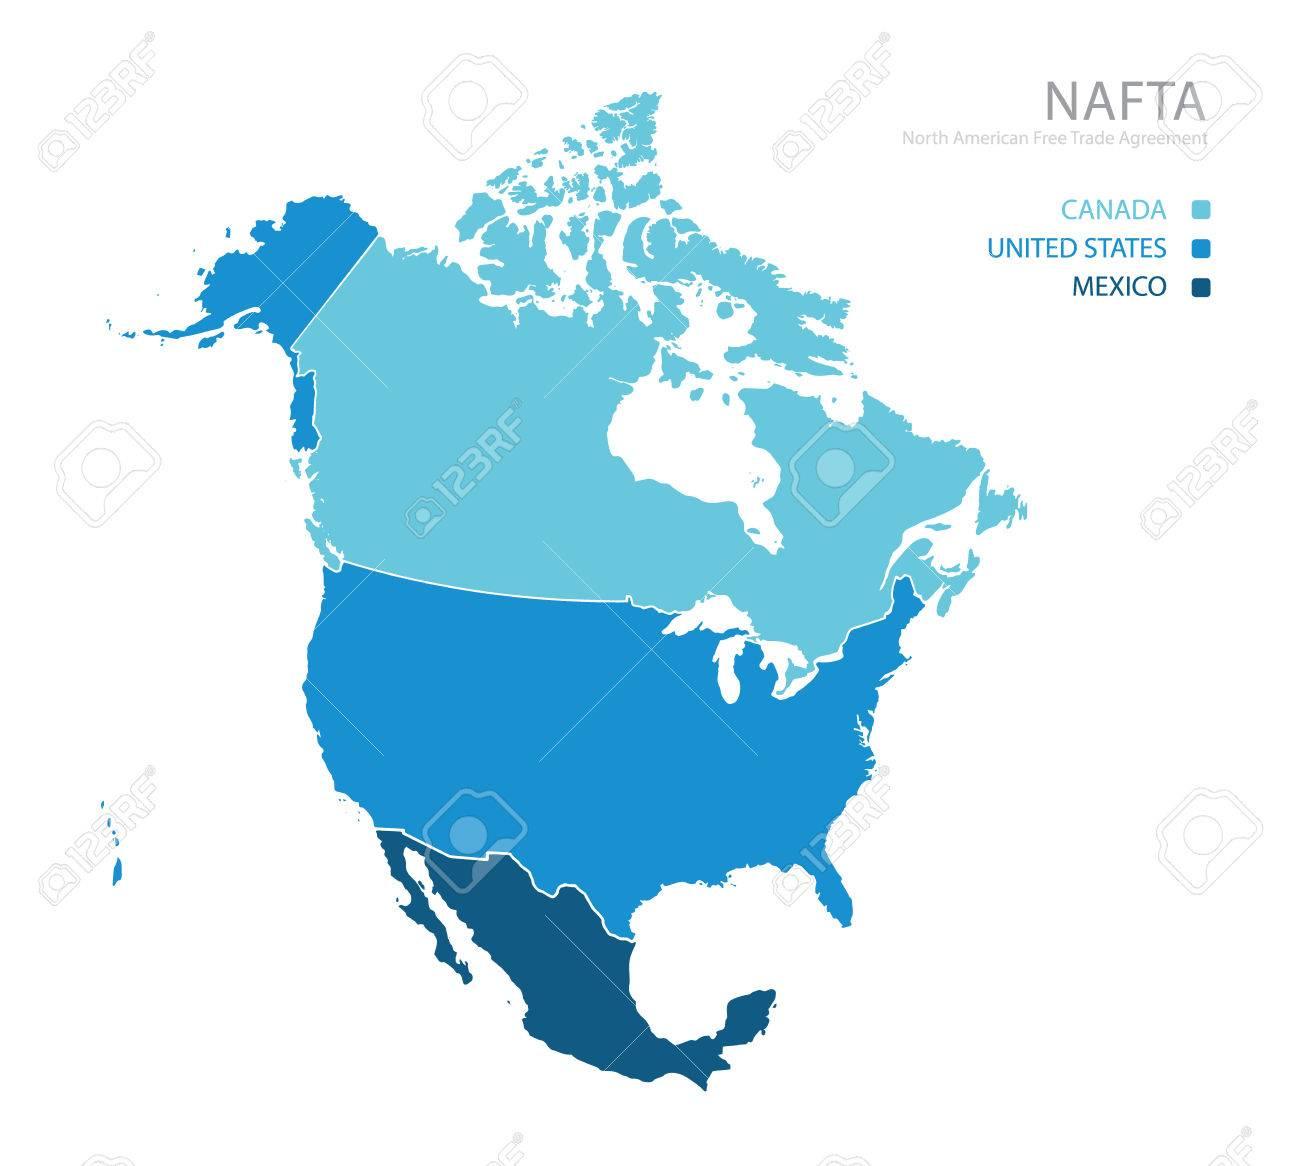 Map of nafta north american free trade agreement royalty free map of nafta north american free trade agreement stock vector 75208461 platinumwayz